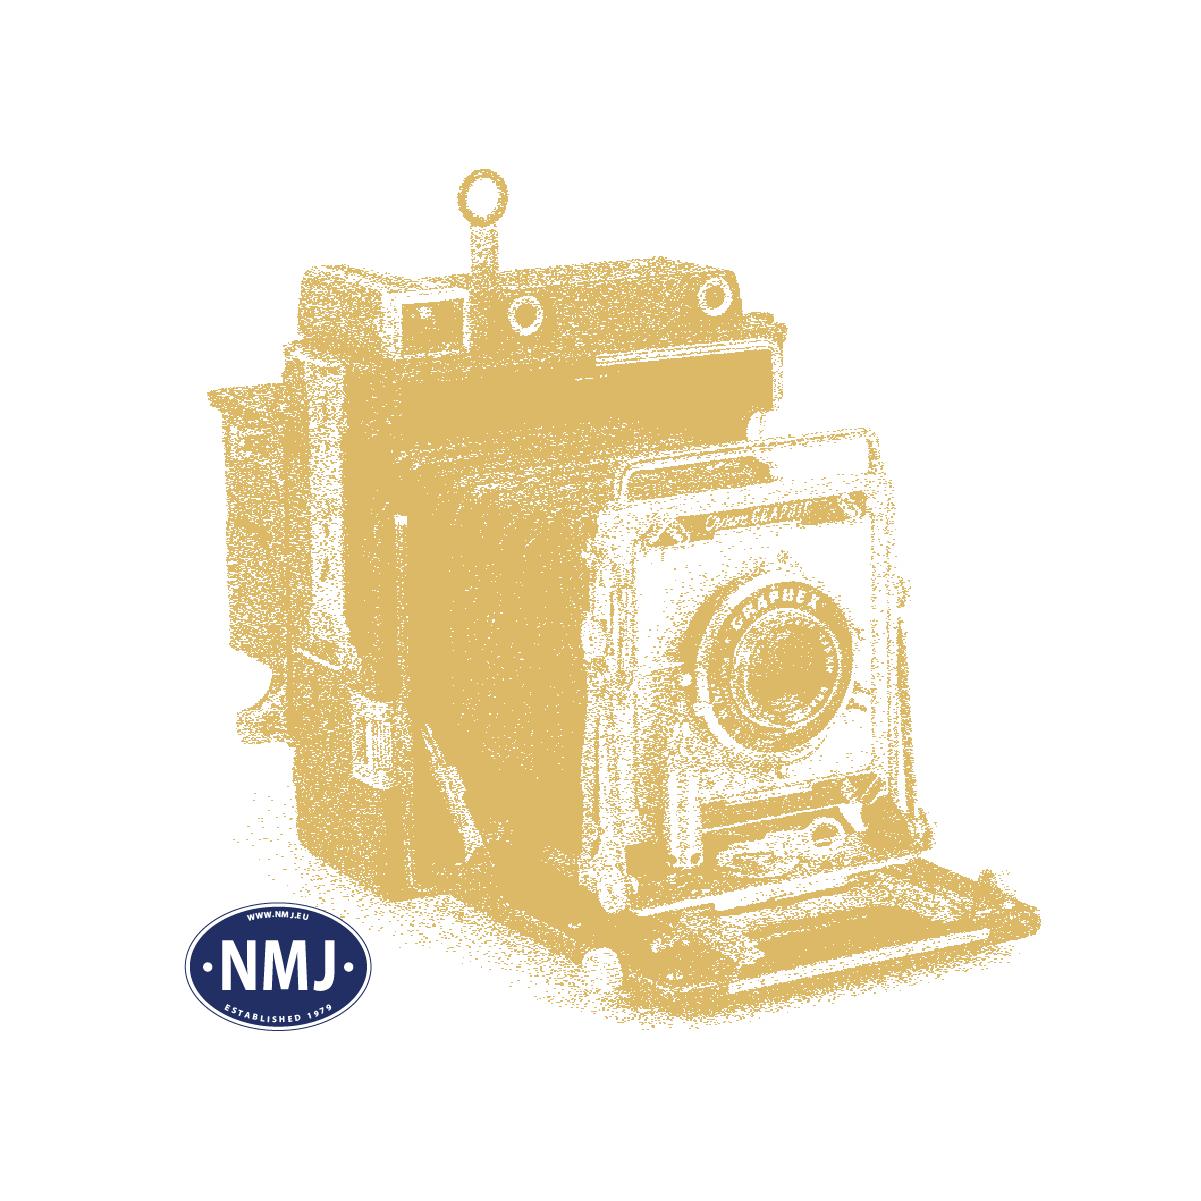 NMJT107.103 - NMJ Topline NSB B3-2.25625 Redbrown livery